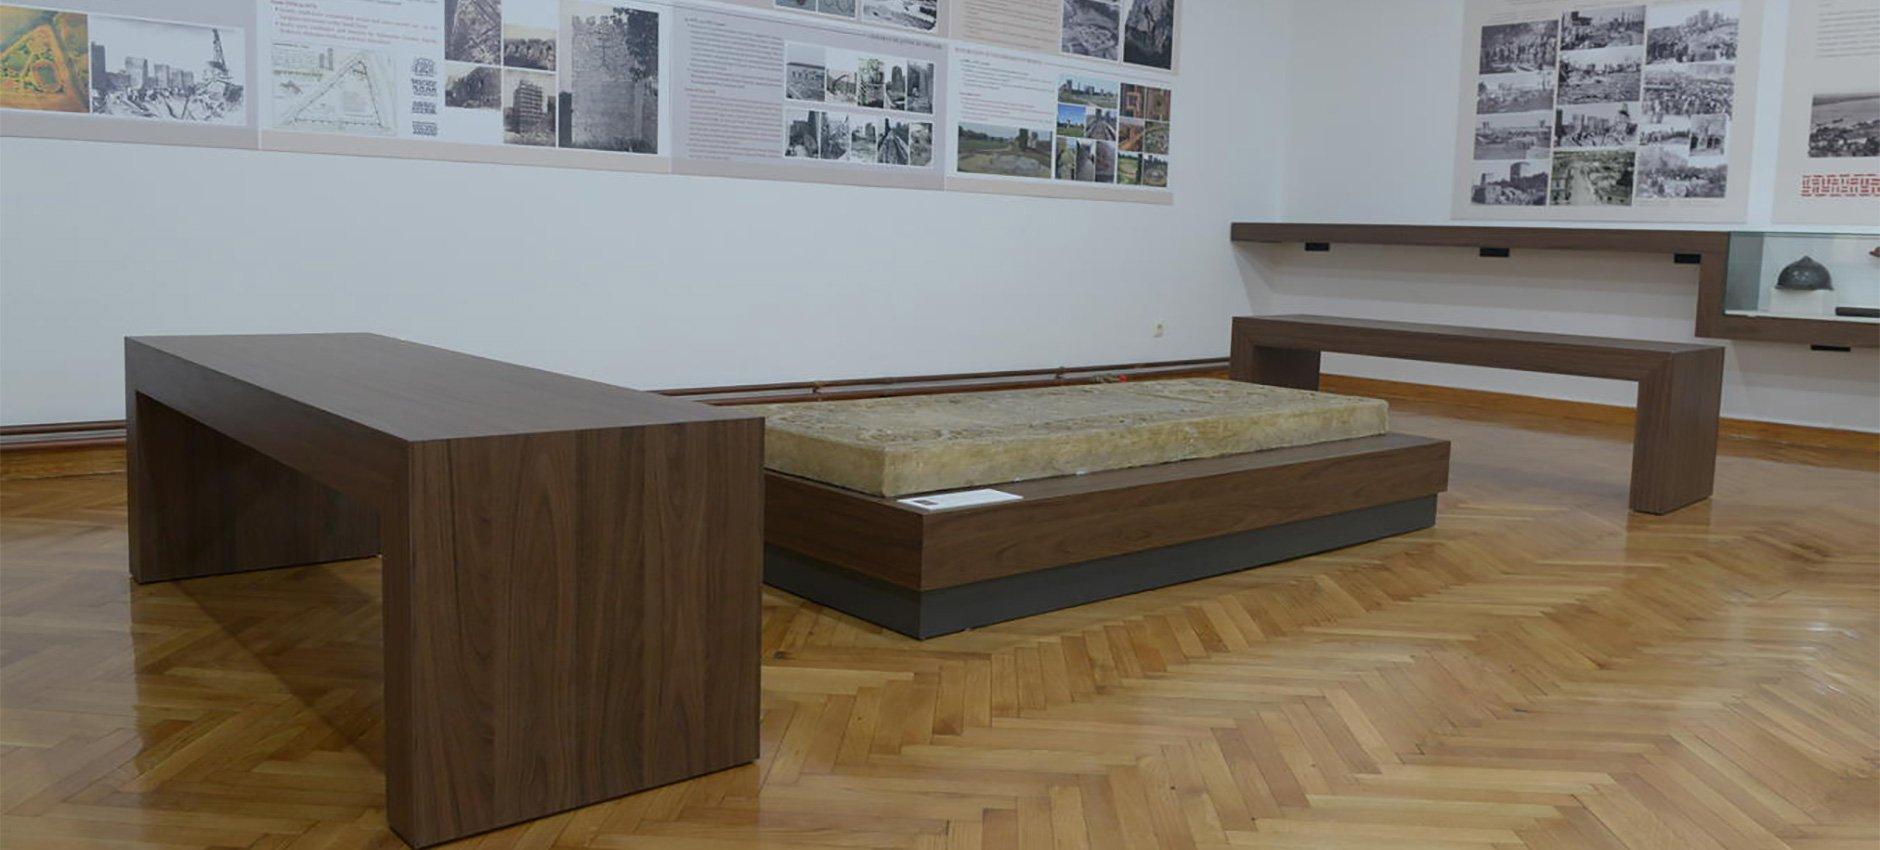 smederevo-muzej-20.jpg